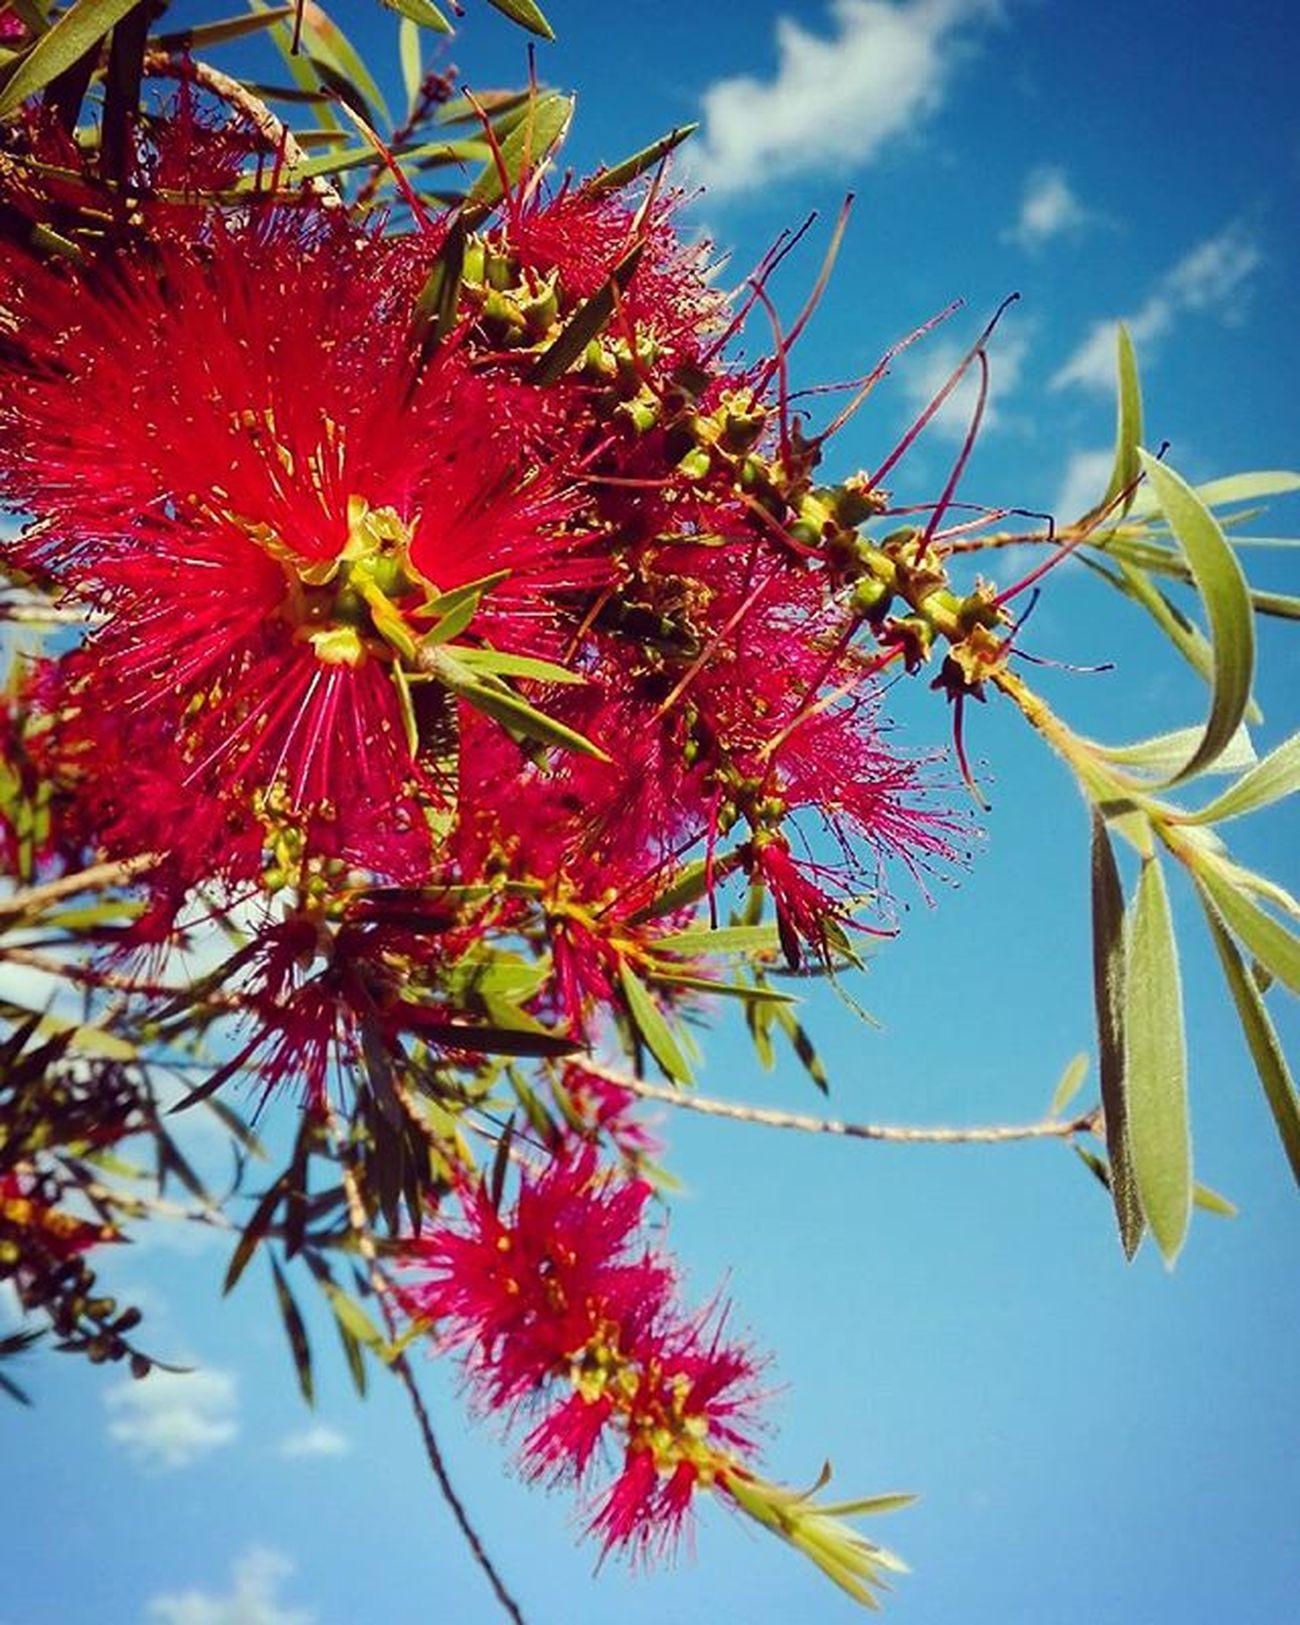 Wattle Summer NZ Newzealand Aotearoa Redandblue Flower Nature Blueskies Backyard Garden Rw_happycolors Rainbow Wall Tt_wt_rflora Ptk_flowers_red1 Hello_red